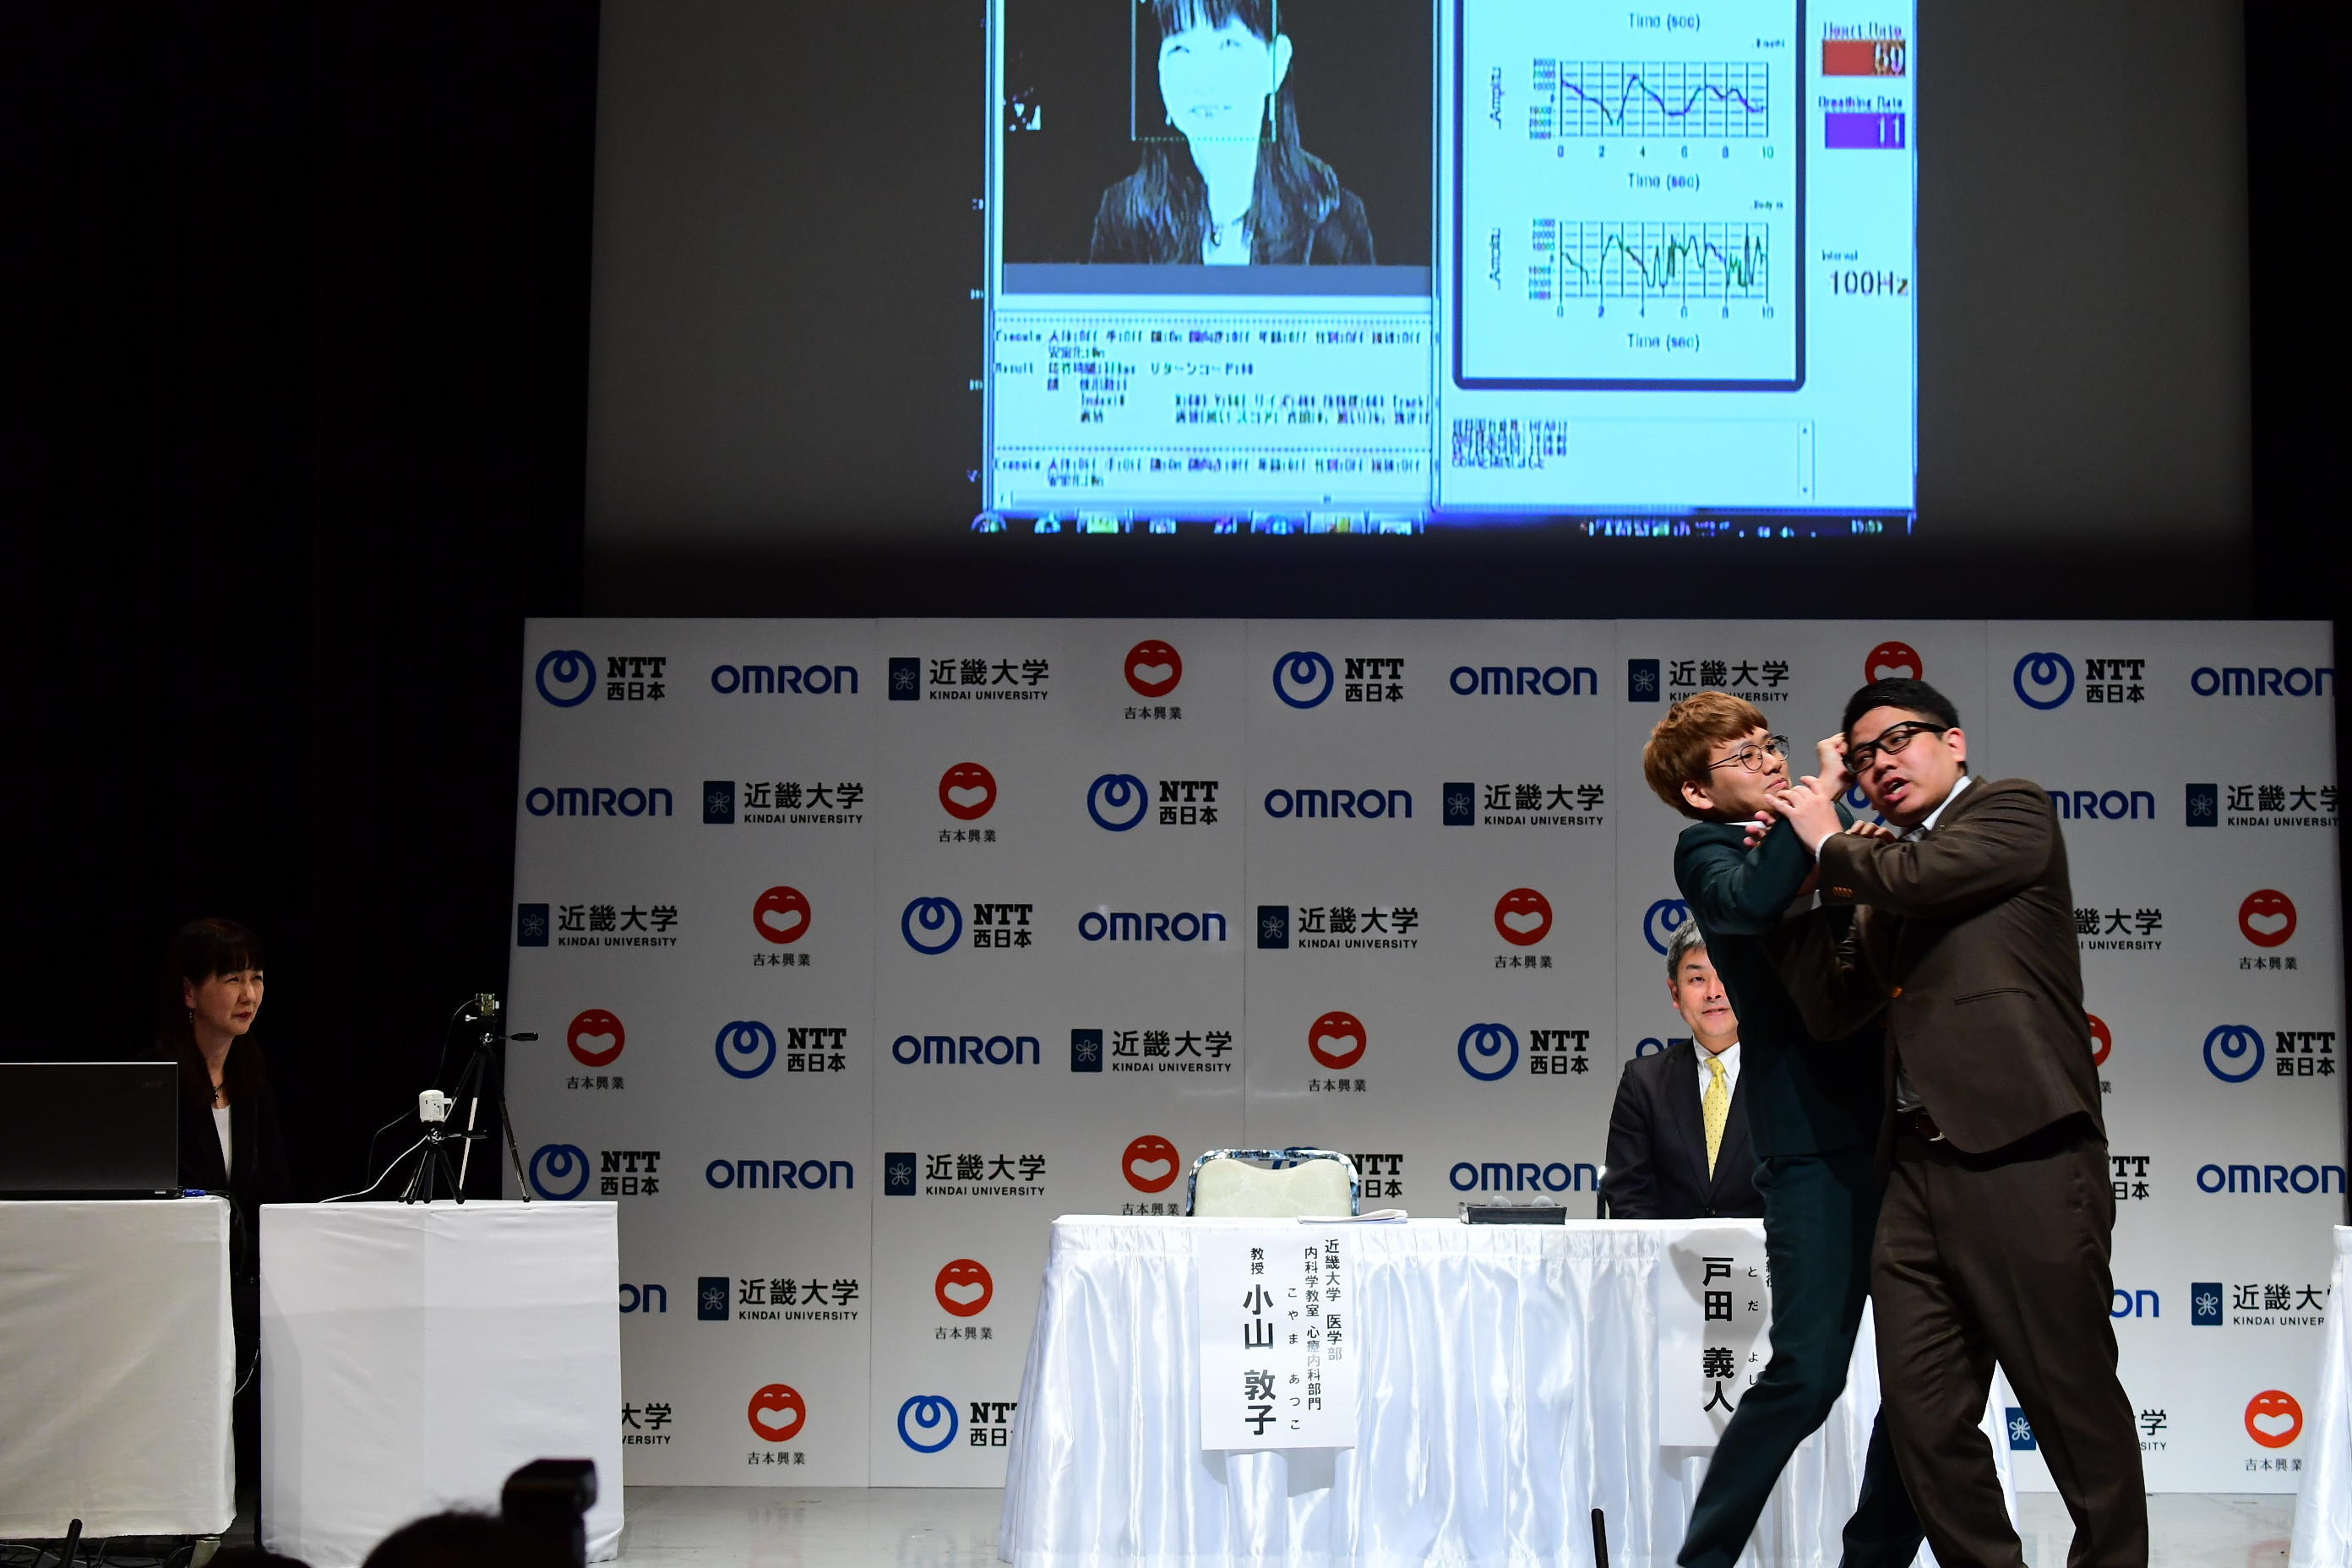 http://news.yoshimoto.co.jp/20170215202556-c7808edebfa1be48003d7bc14e3f0a4530d6bb72.jpg